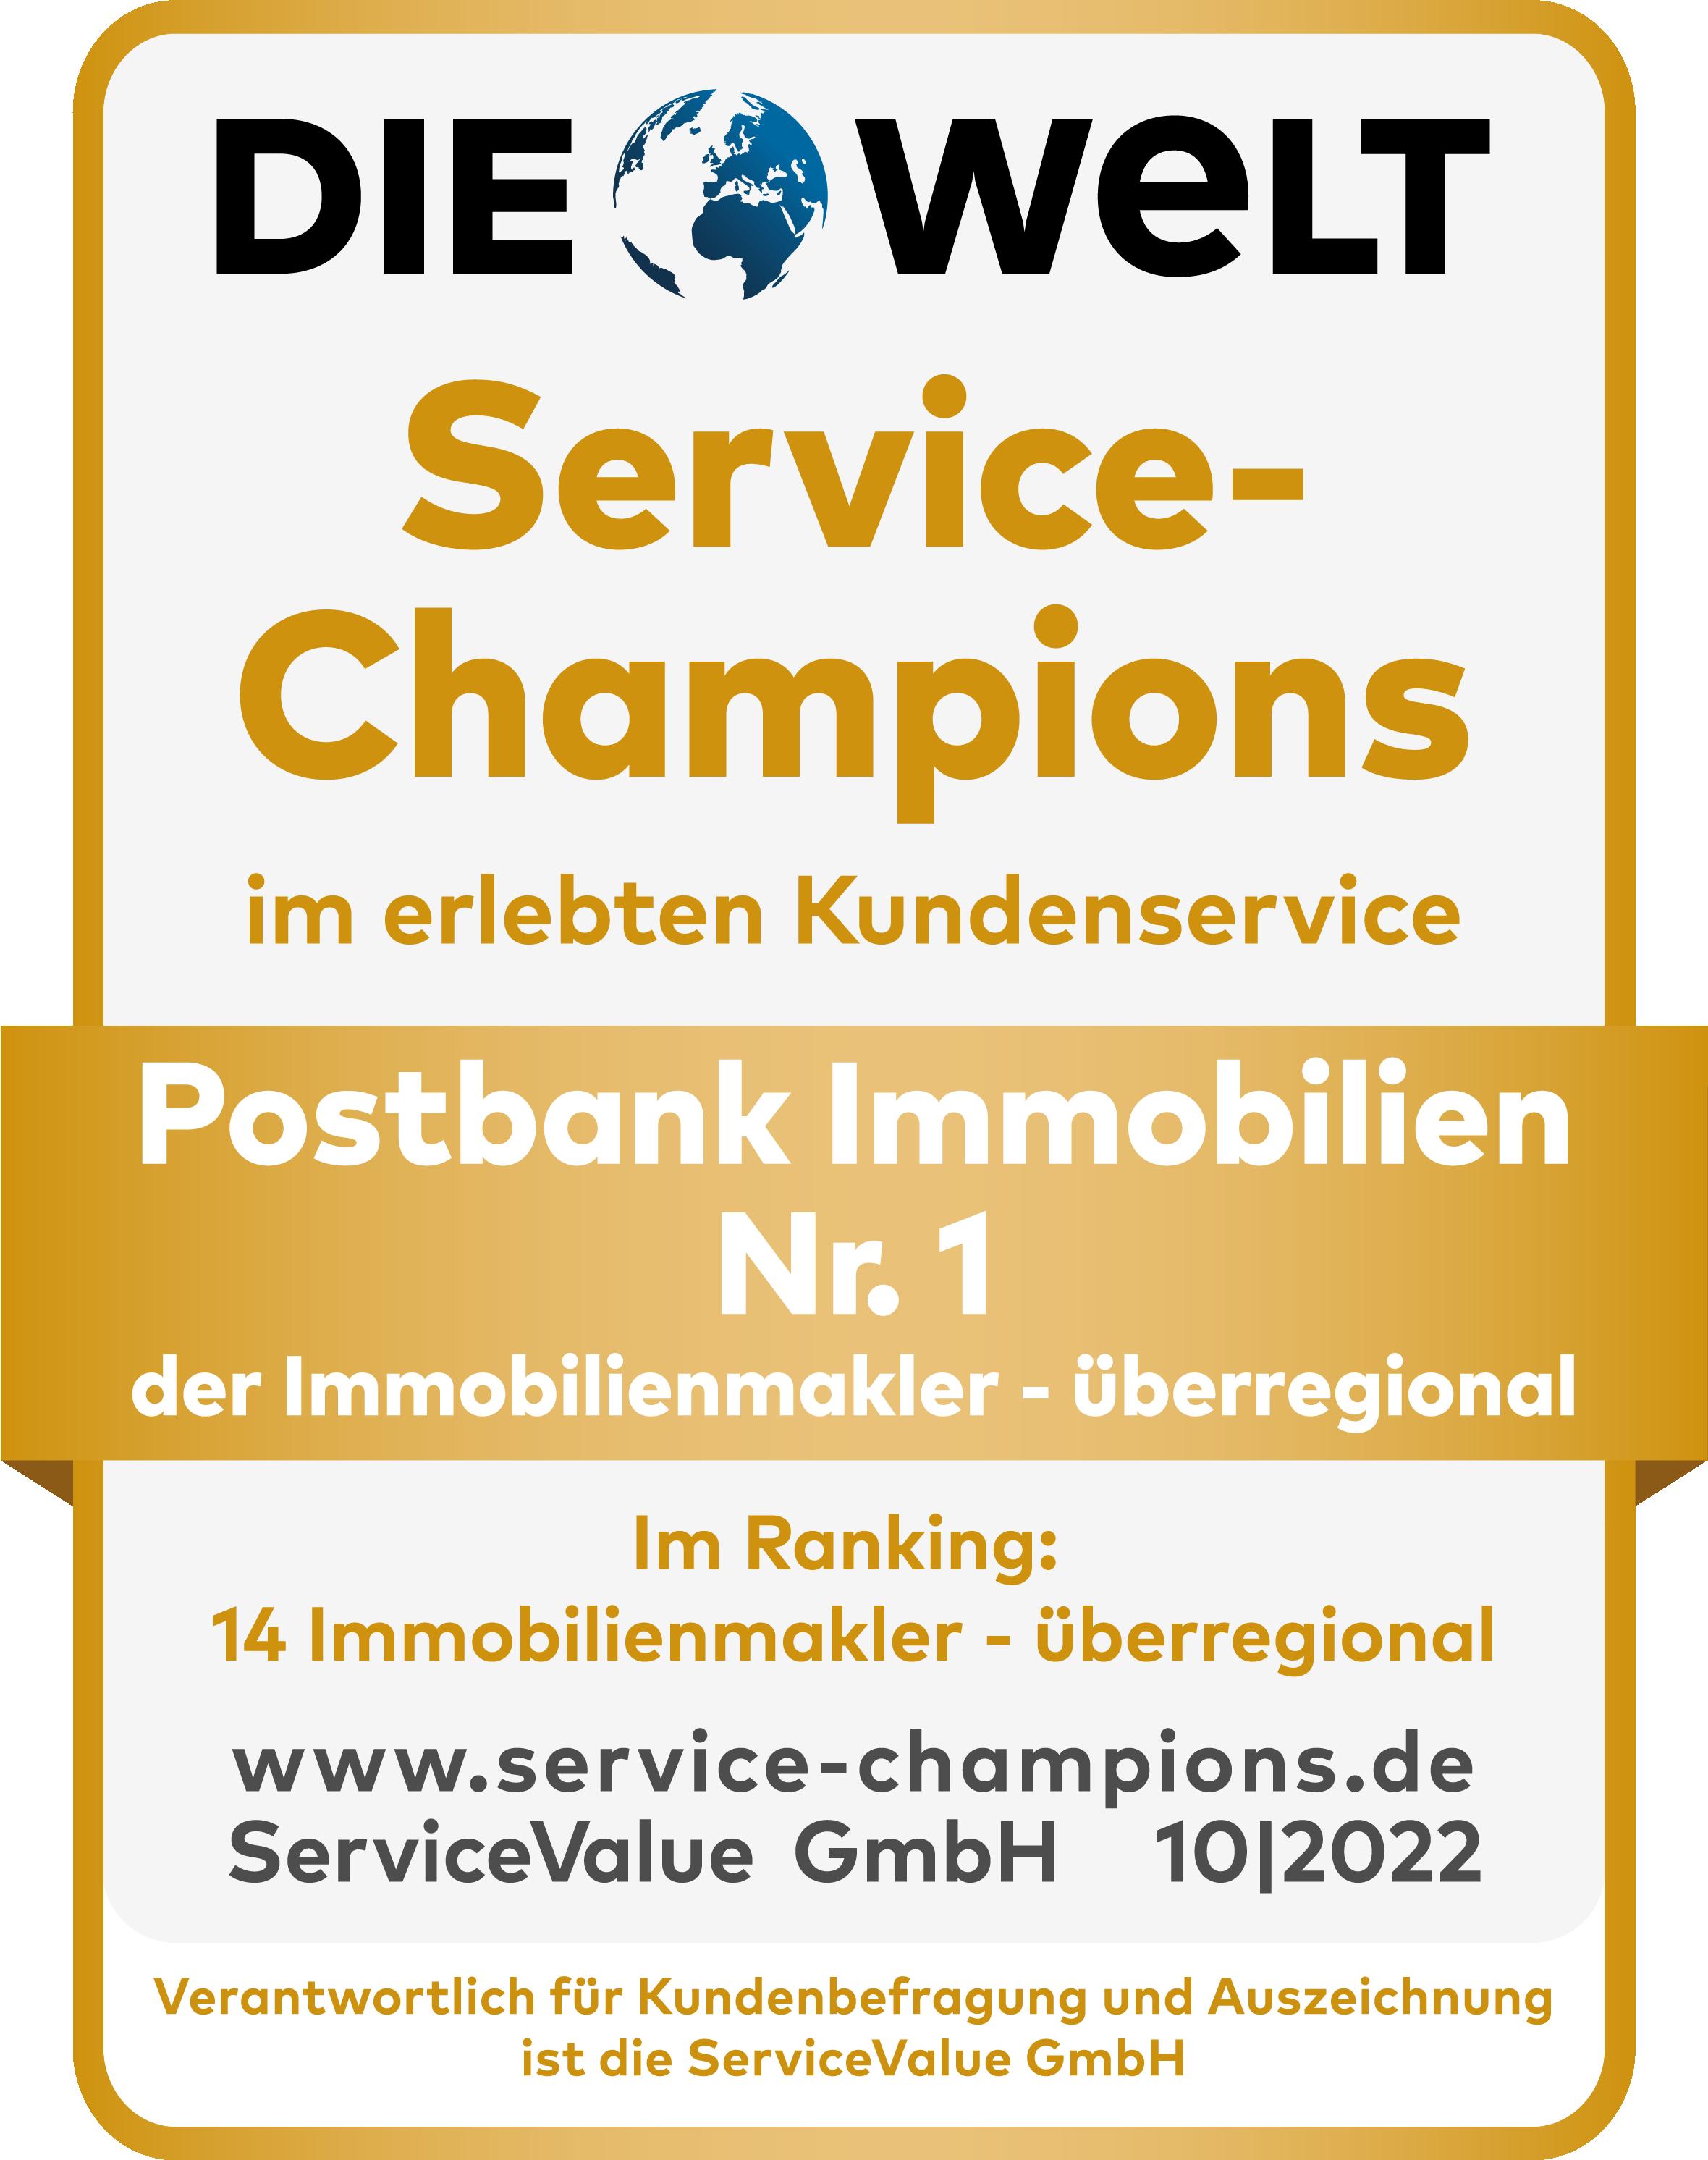 Immobilienangebote - Postbank Immobilien - Der ...